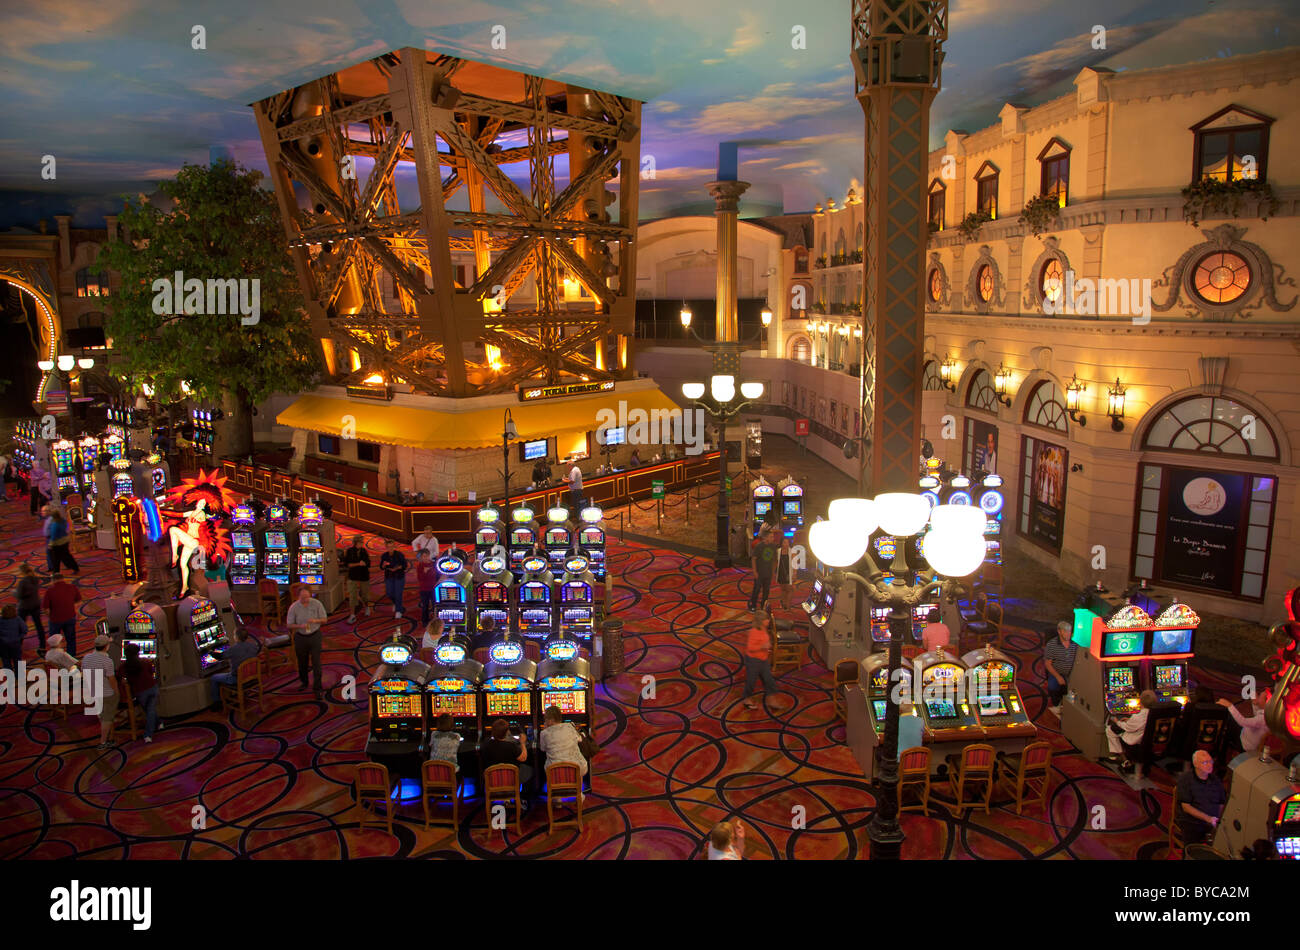 m hotel casino las vegas nv